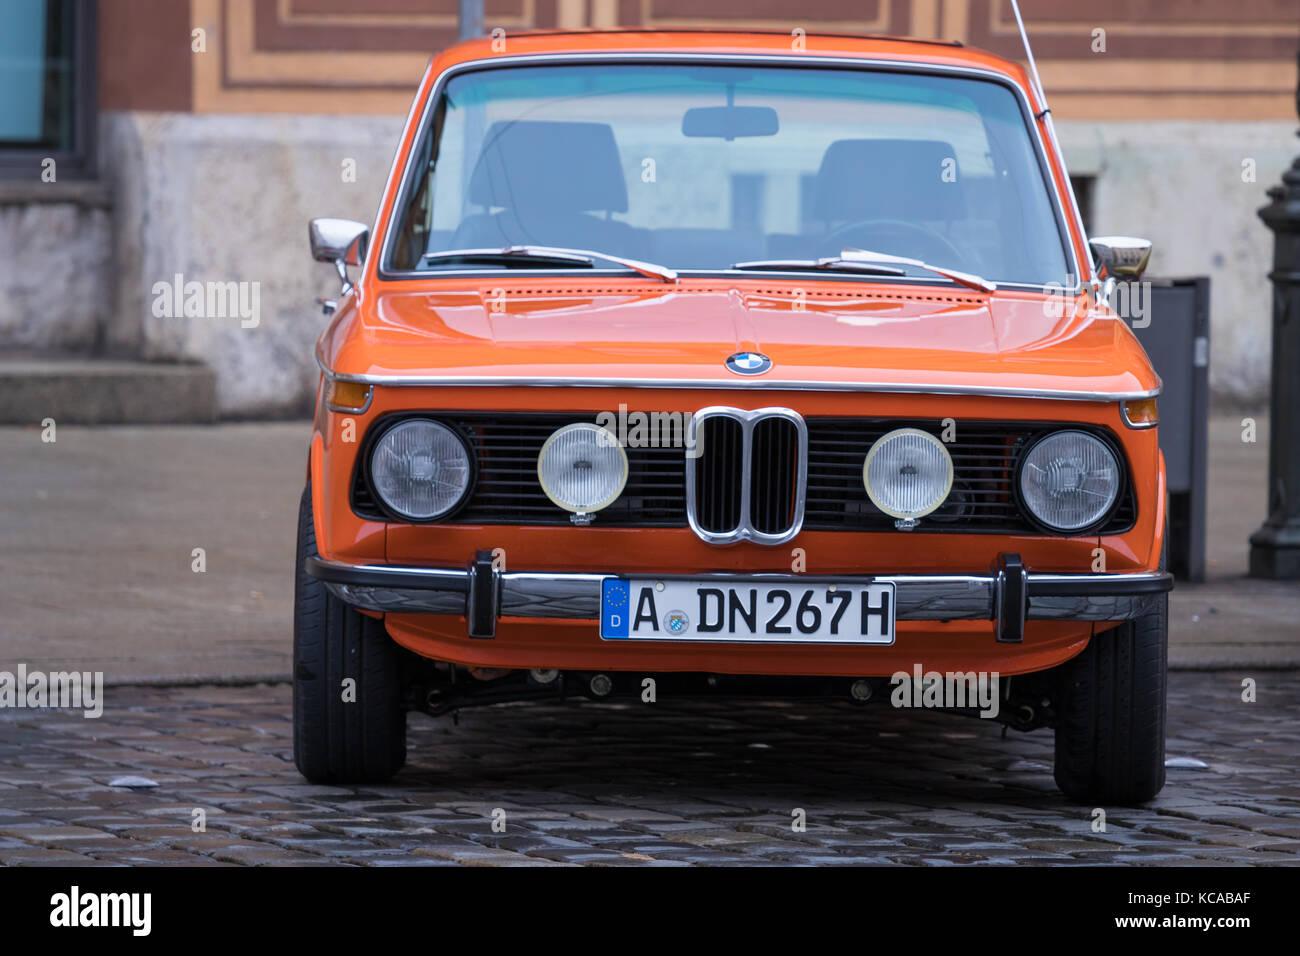 Bmw 2002 Tii Race Car >> Vintage Bmw Car Stock Photos & Vintage Bmw Car Stock Images - Alamy